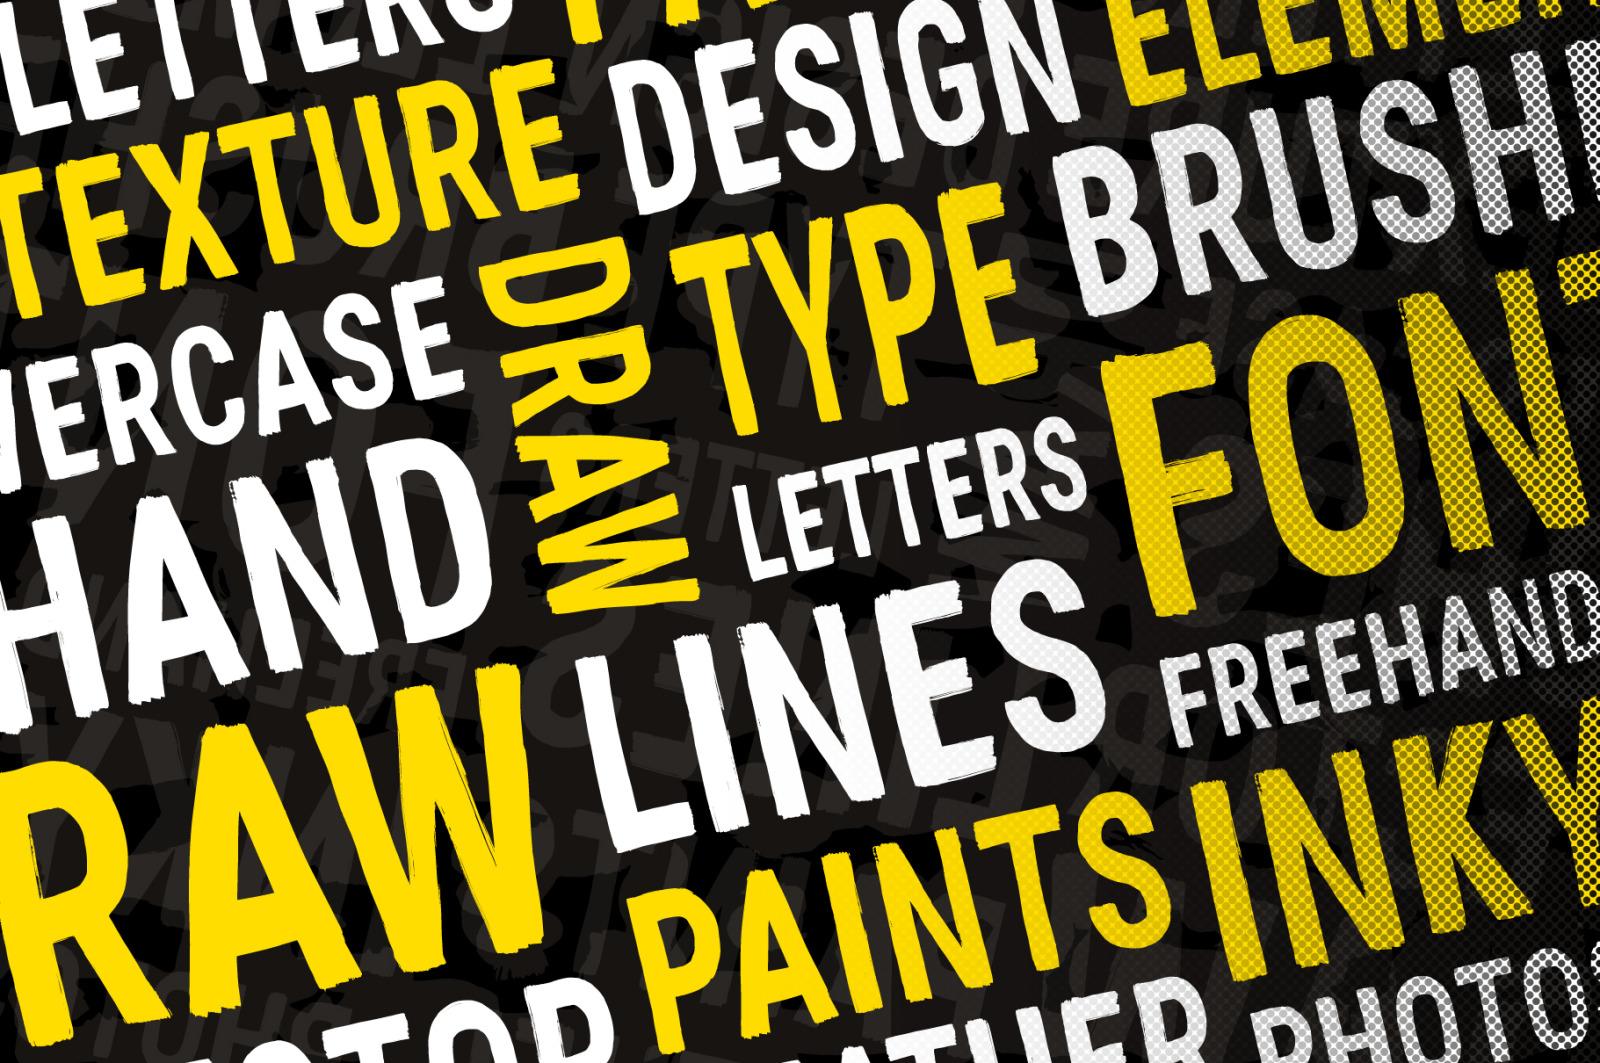 Flat Brush: A Textured Hand-made Brush Font